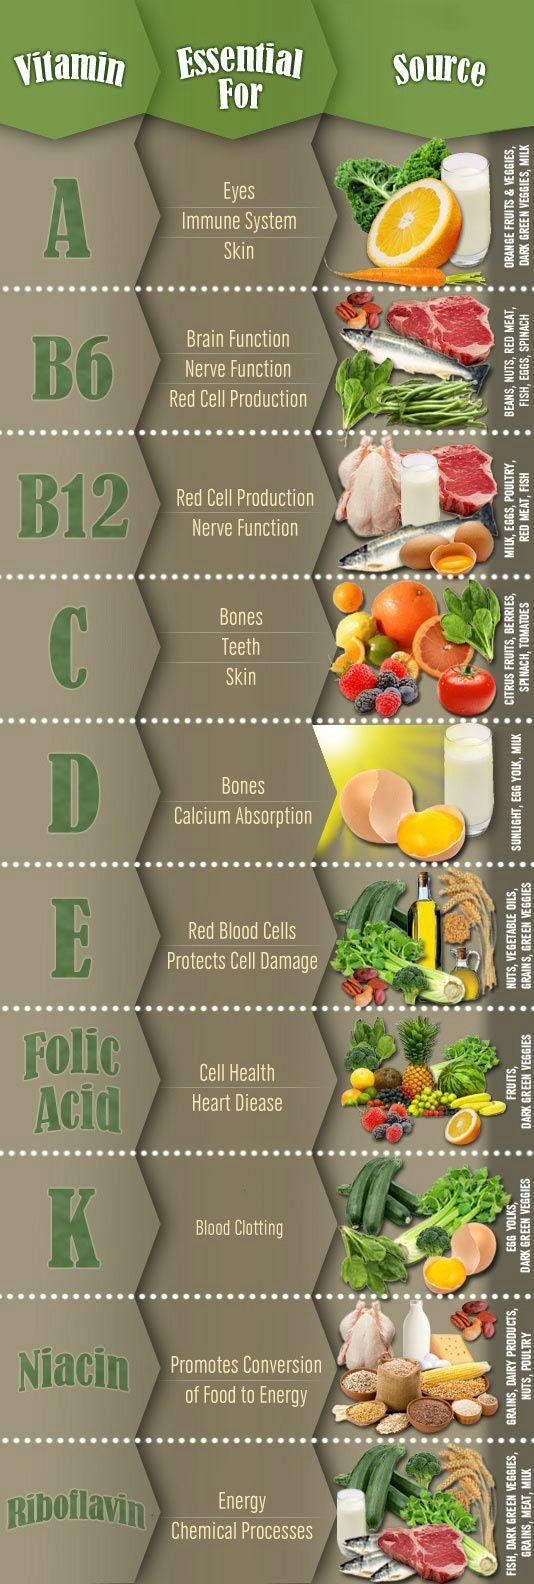 #vitamins #minerals